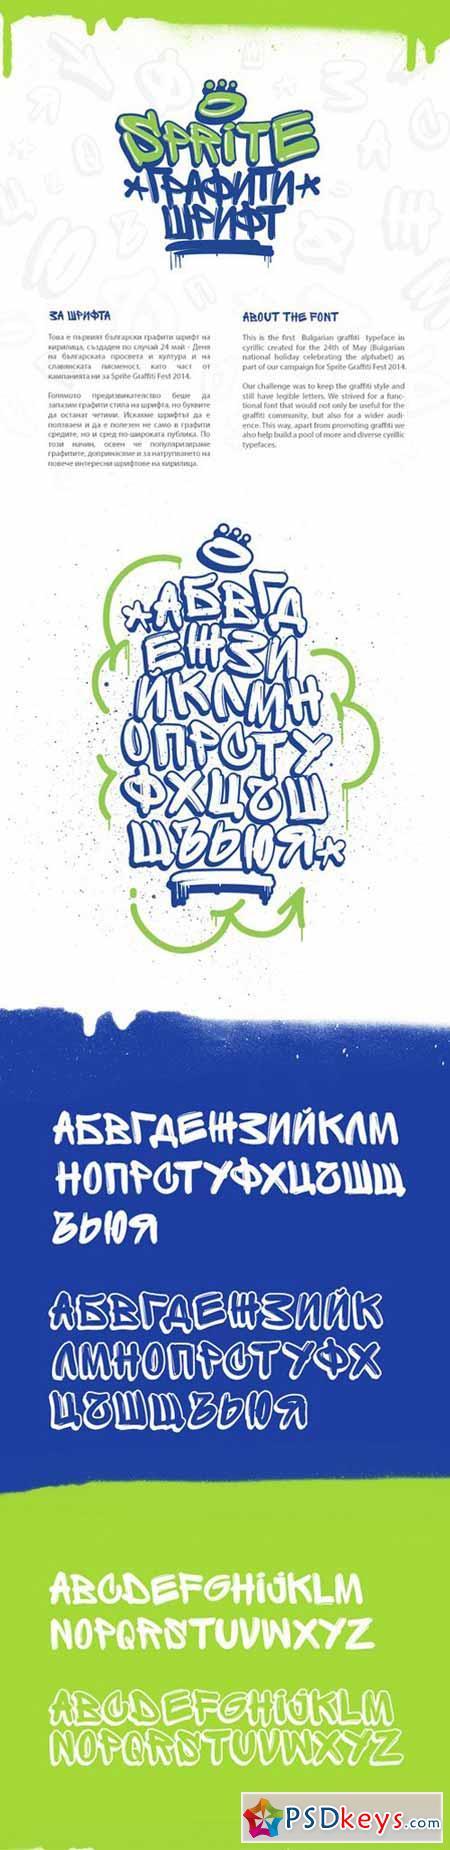 Download Sprite Graffiti Font » Free Download Photoshop Vector ...